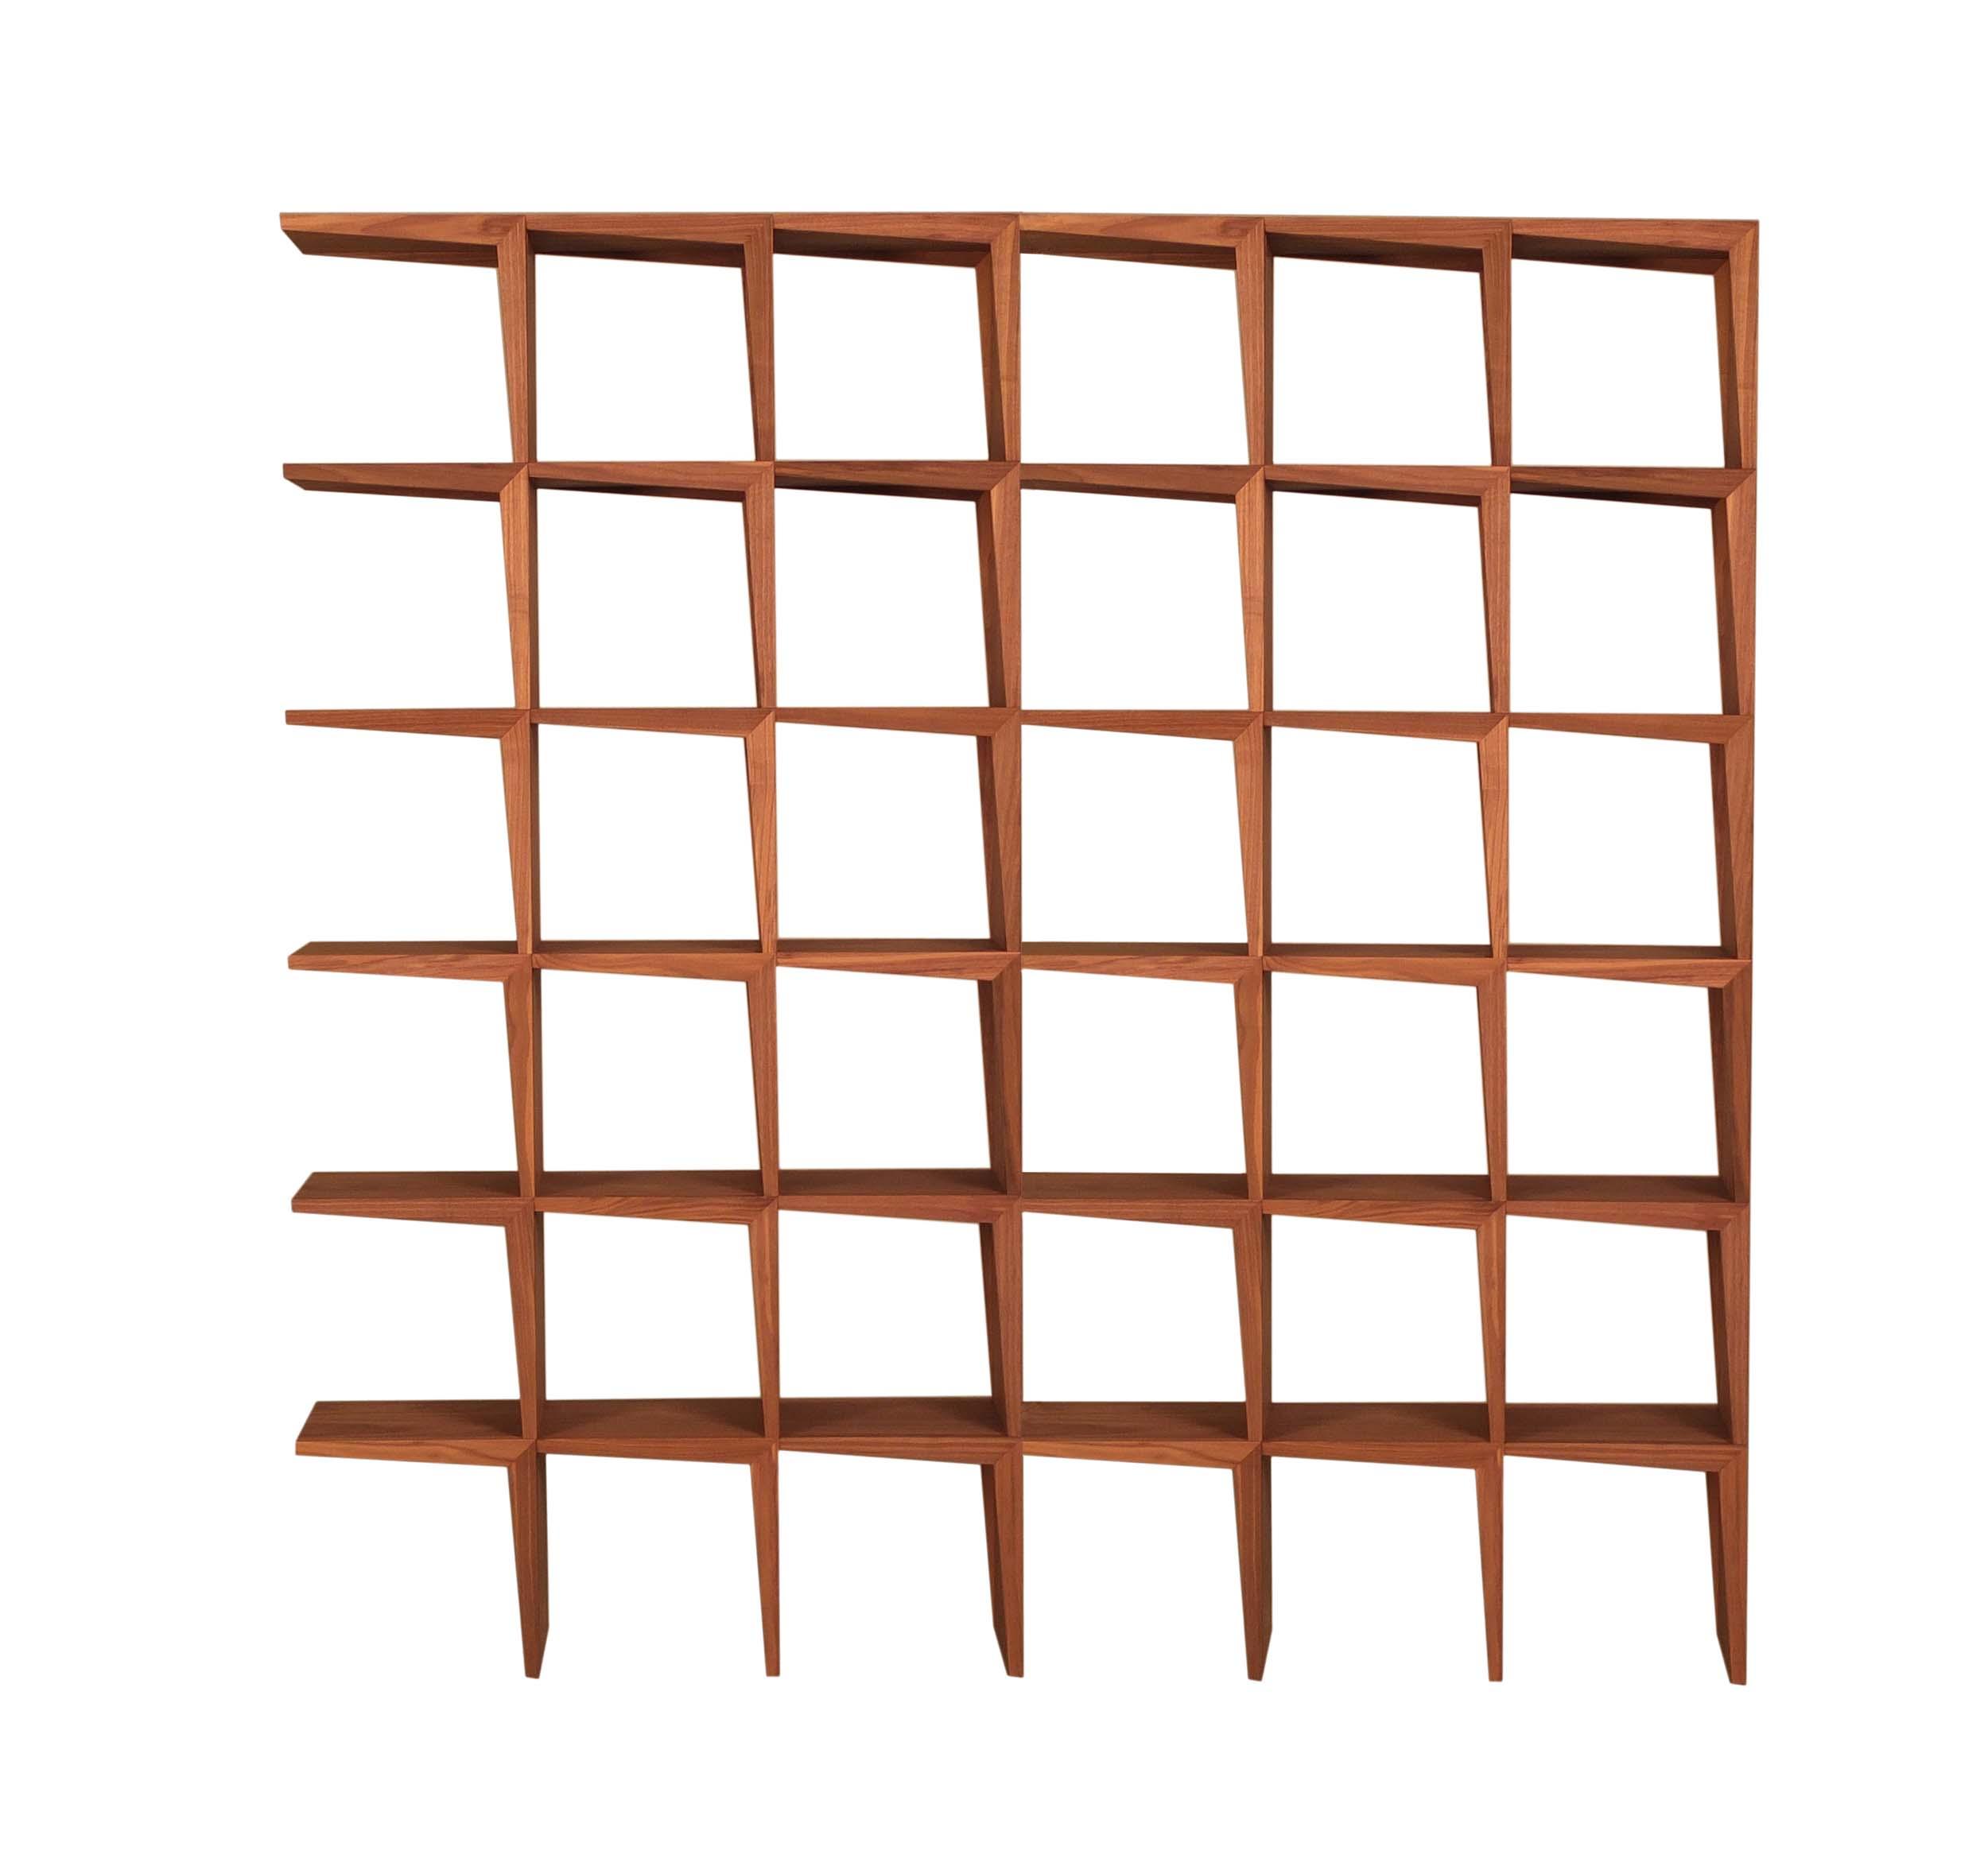 Kant Bookcase by Itamar Harari for Morelato